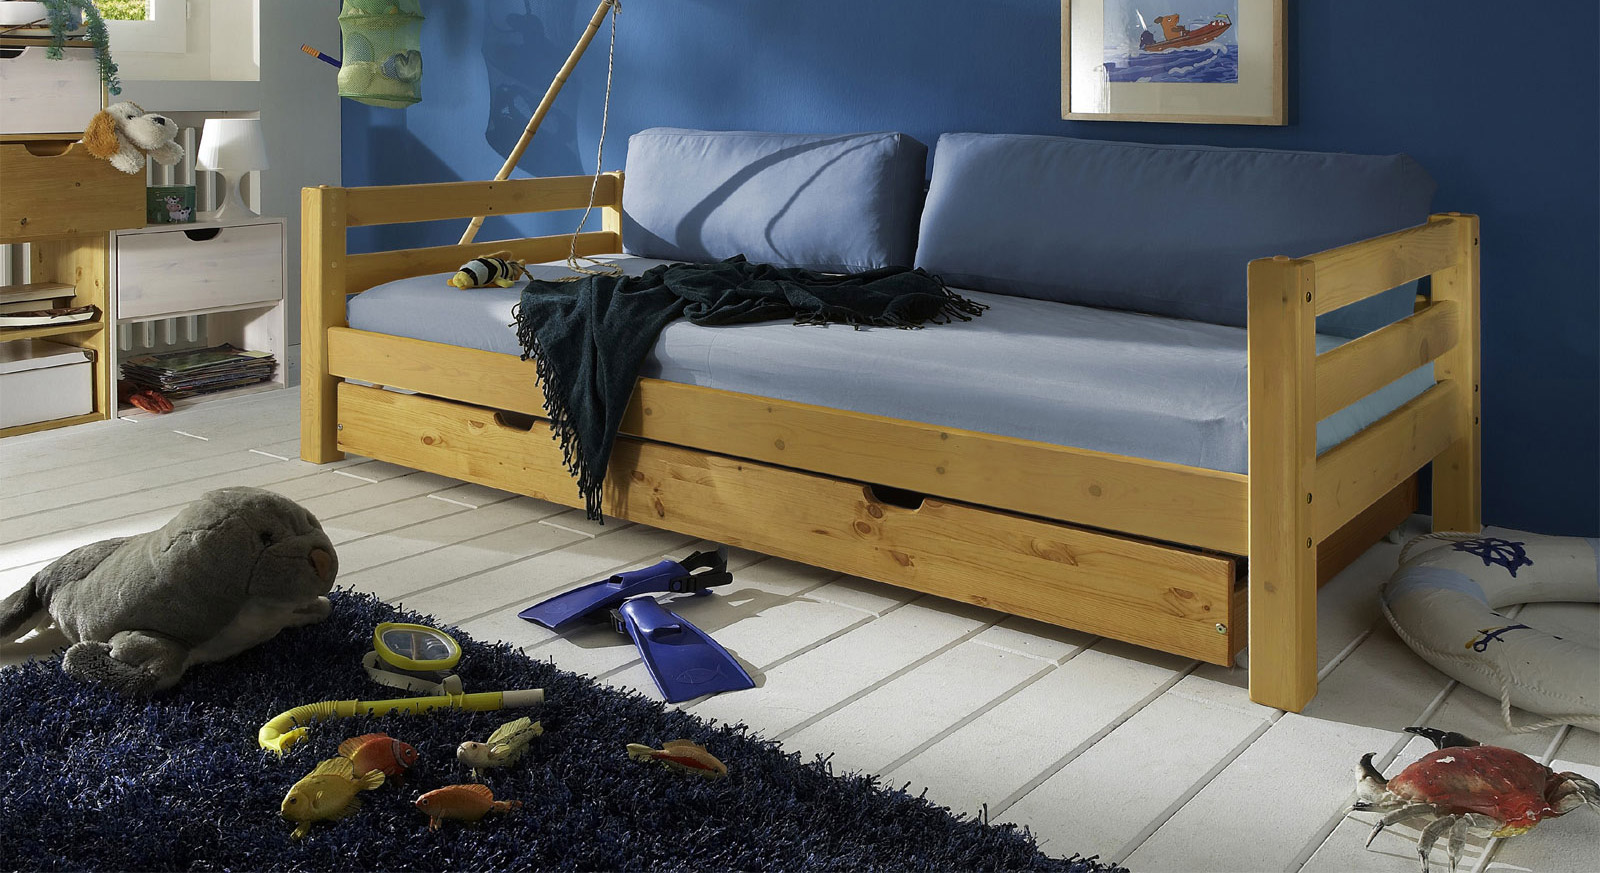 jugendbett zum ausziehen aus massivholzbett kids paradise. Black Bedroom Furniture Sets. Home Design Ideas